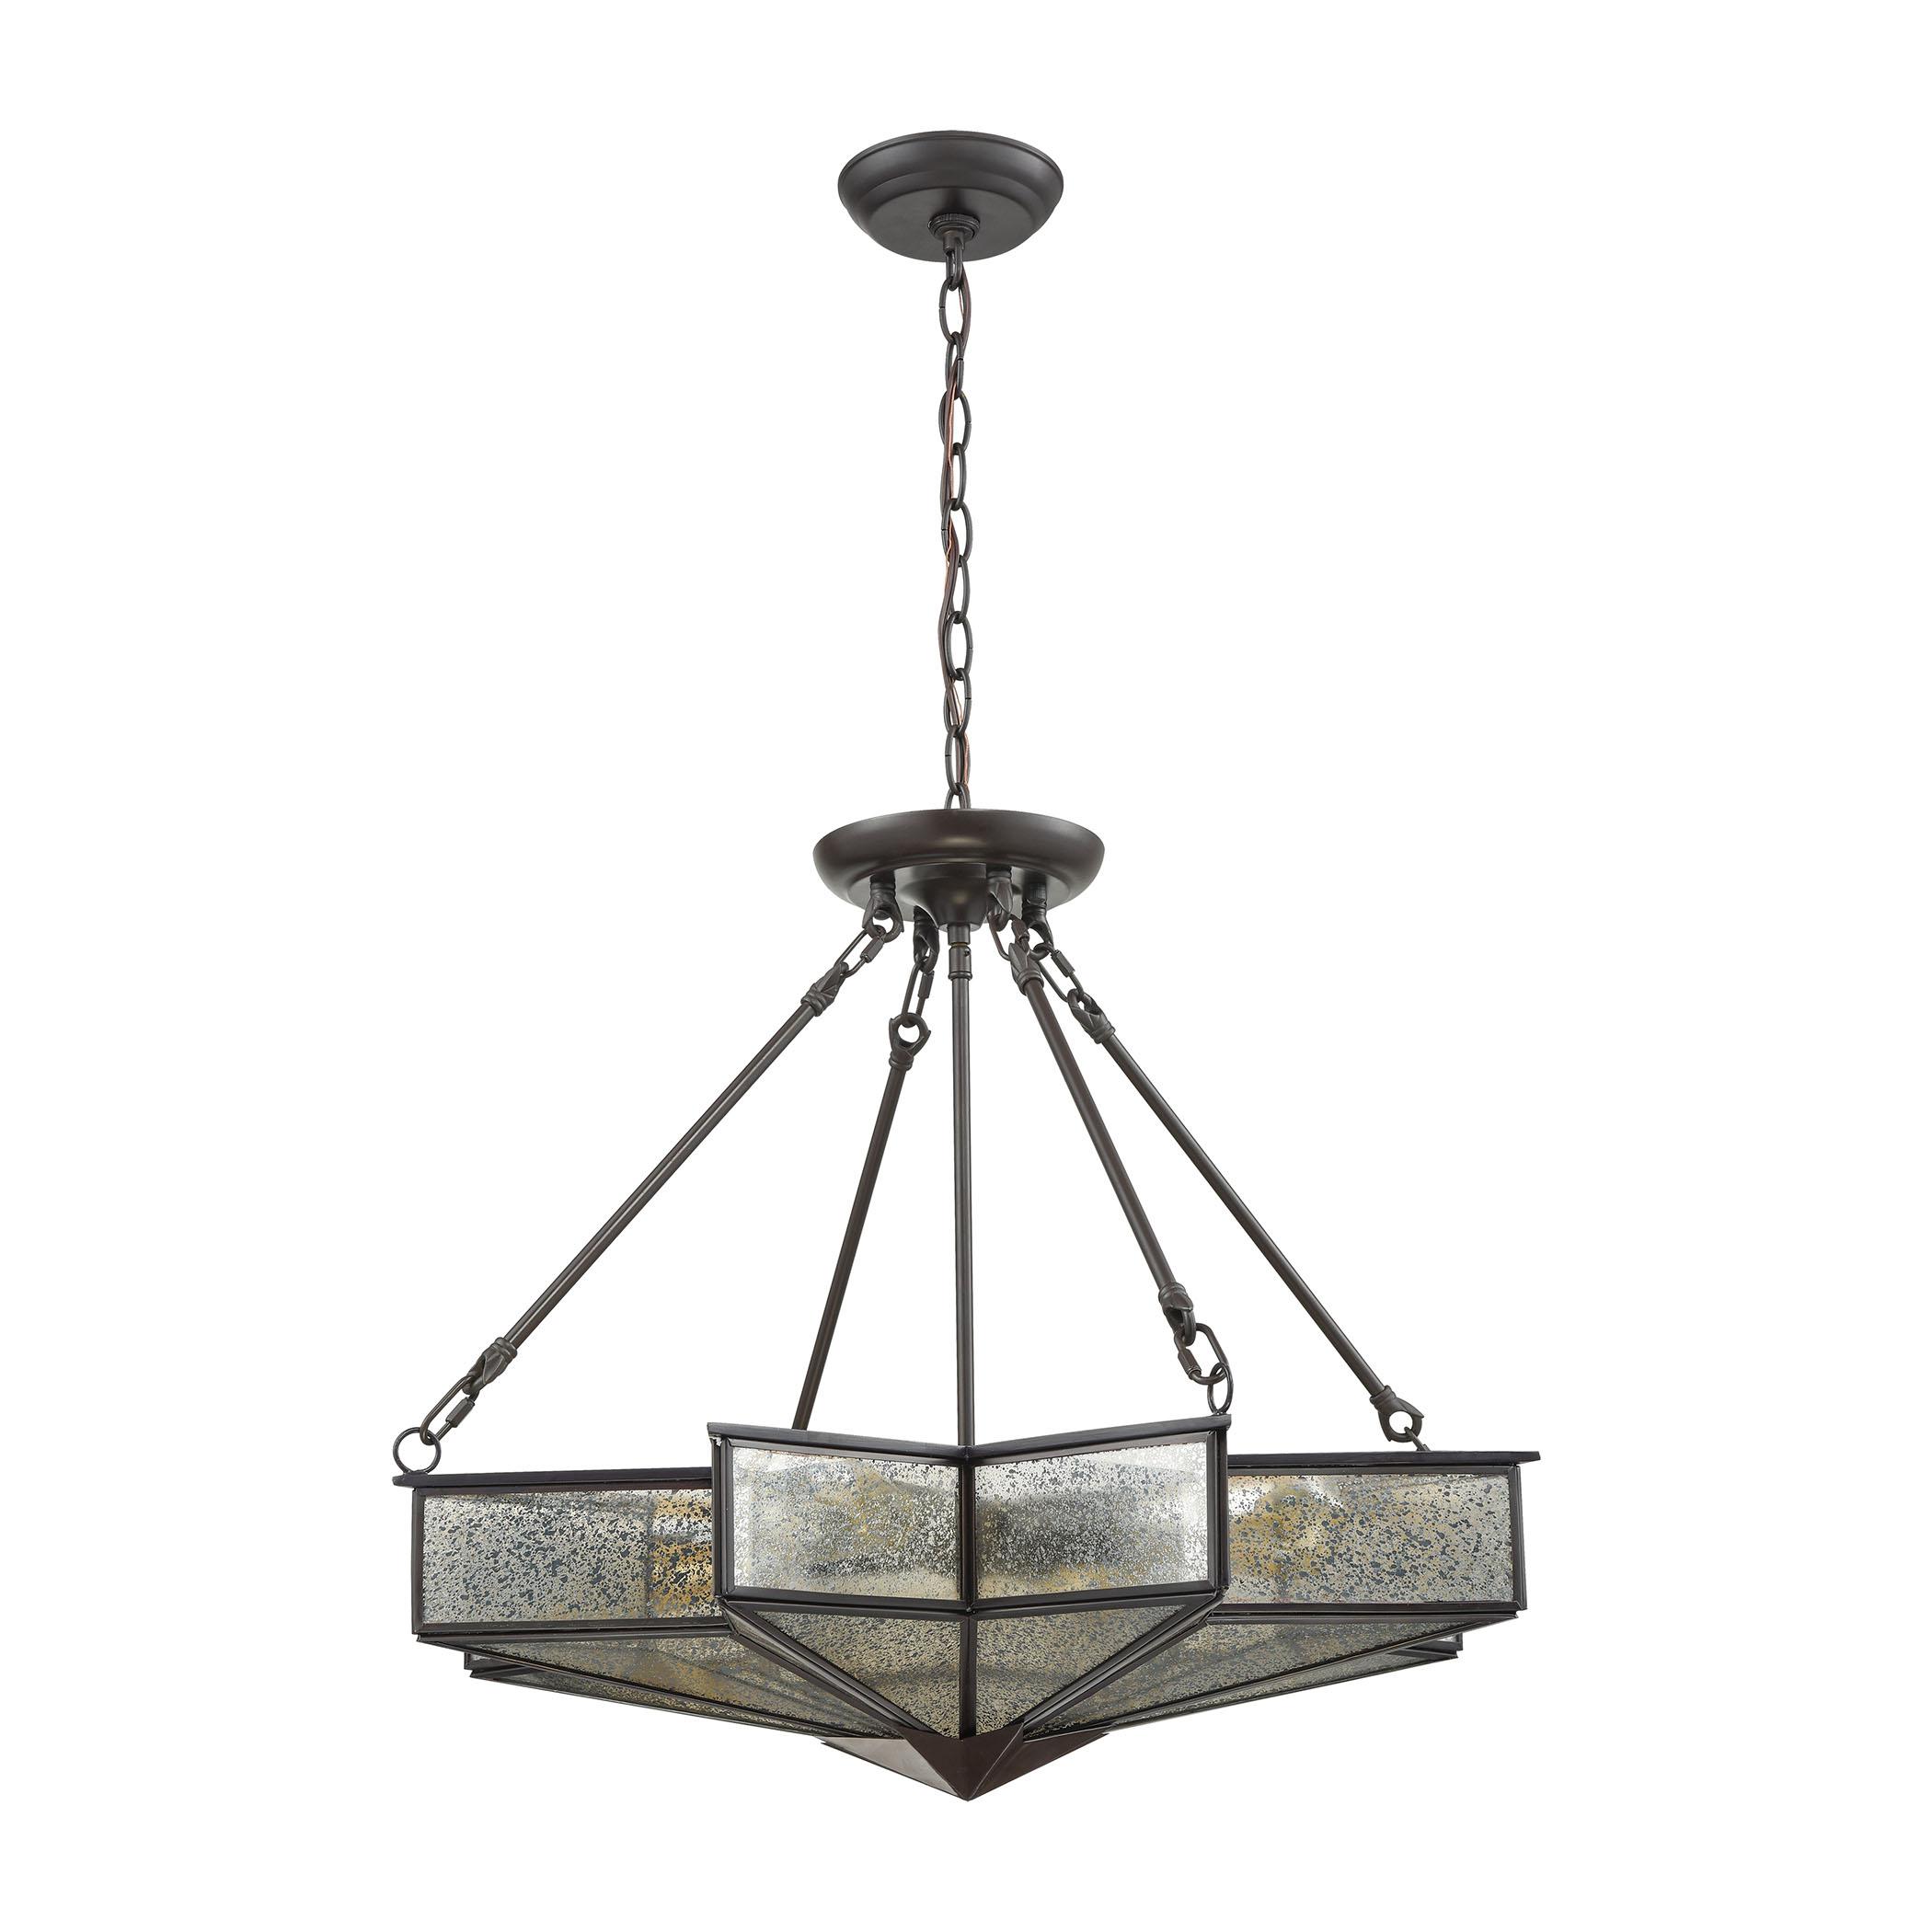 bronze kitchen chandelier wolf decostar 4 light in oil rubbed by elk